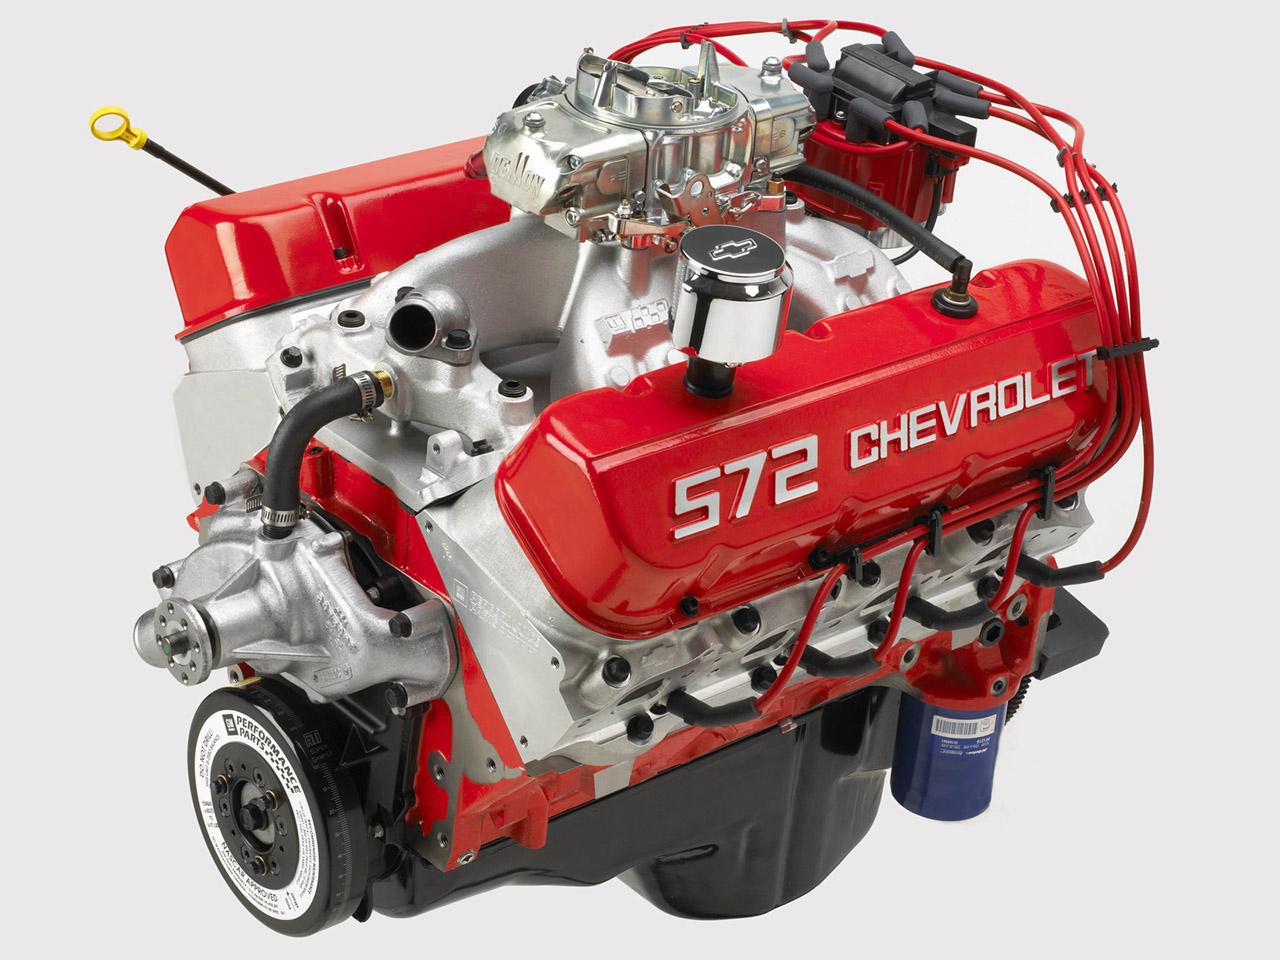 http://4.bp.blogspot.com/_IqxkmF9-pdU/TUDH4033lDI/AAAAAAAAABc/_qyV1a8c-0w/s1600/1955-Buick-Roadmaster-Jay-Leno-572-Crate-Motor-1280x960.jpg